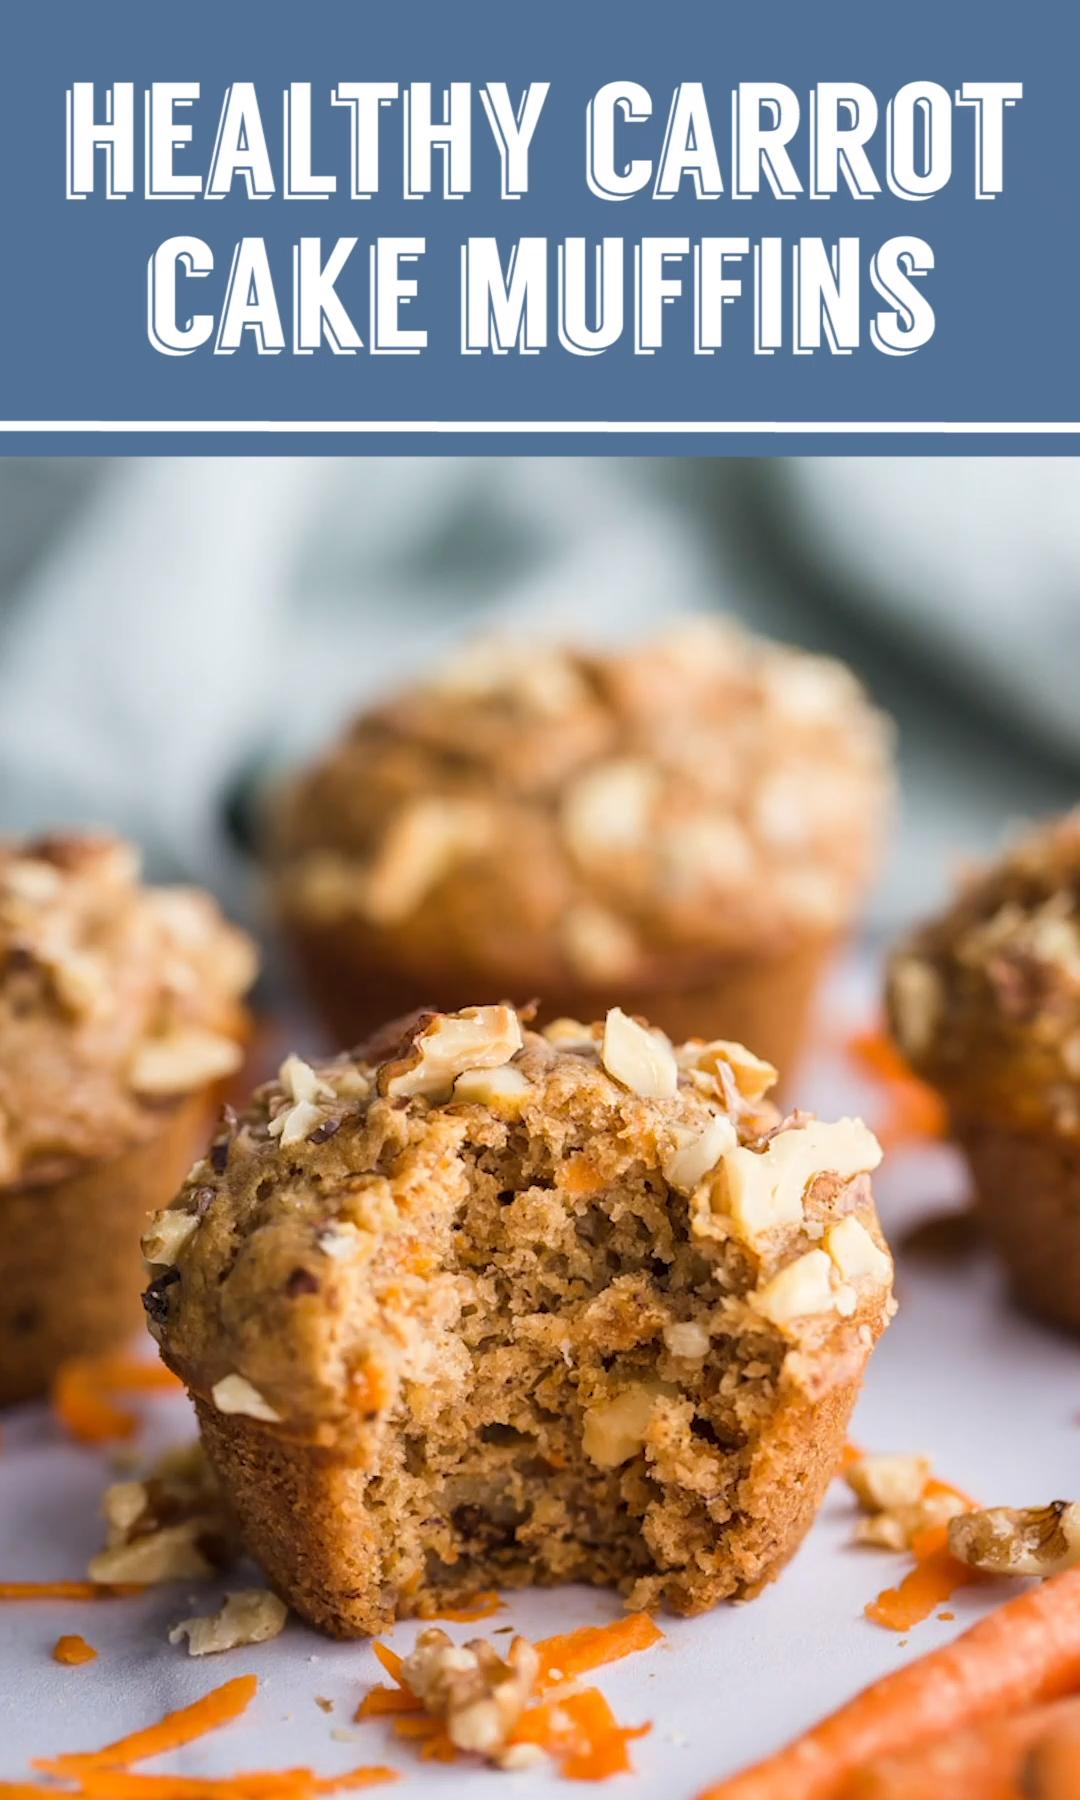 Healthy Carrot Cake Muffins Healthy Carrot Cake Mu